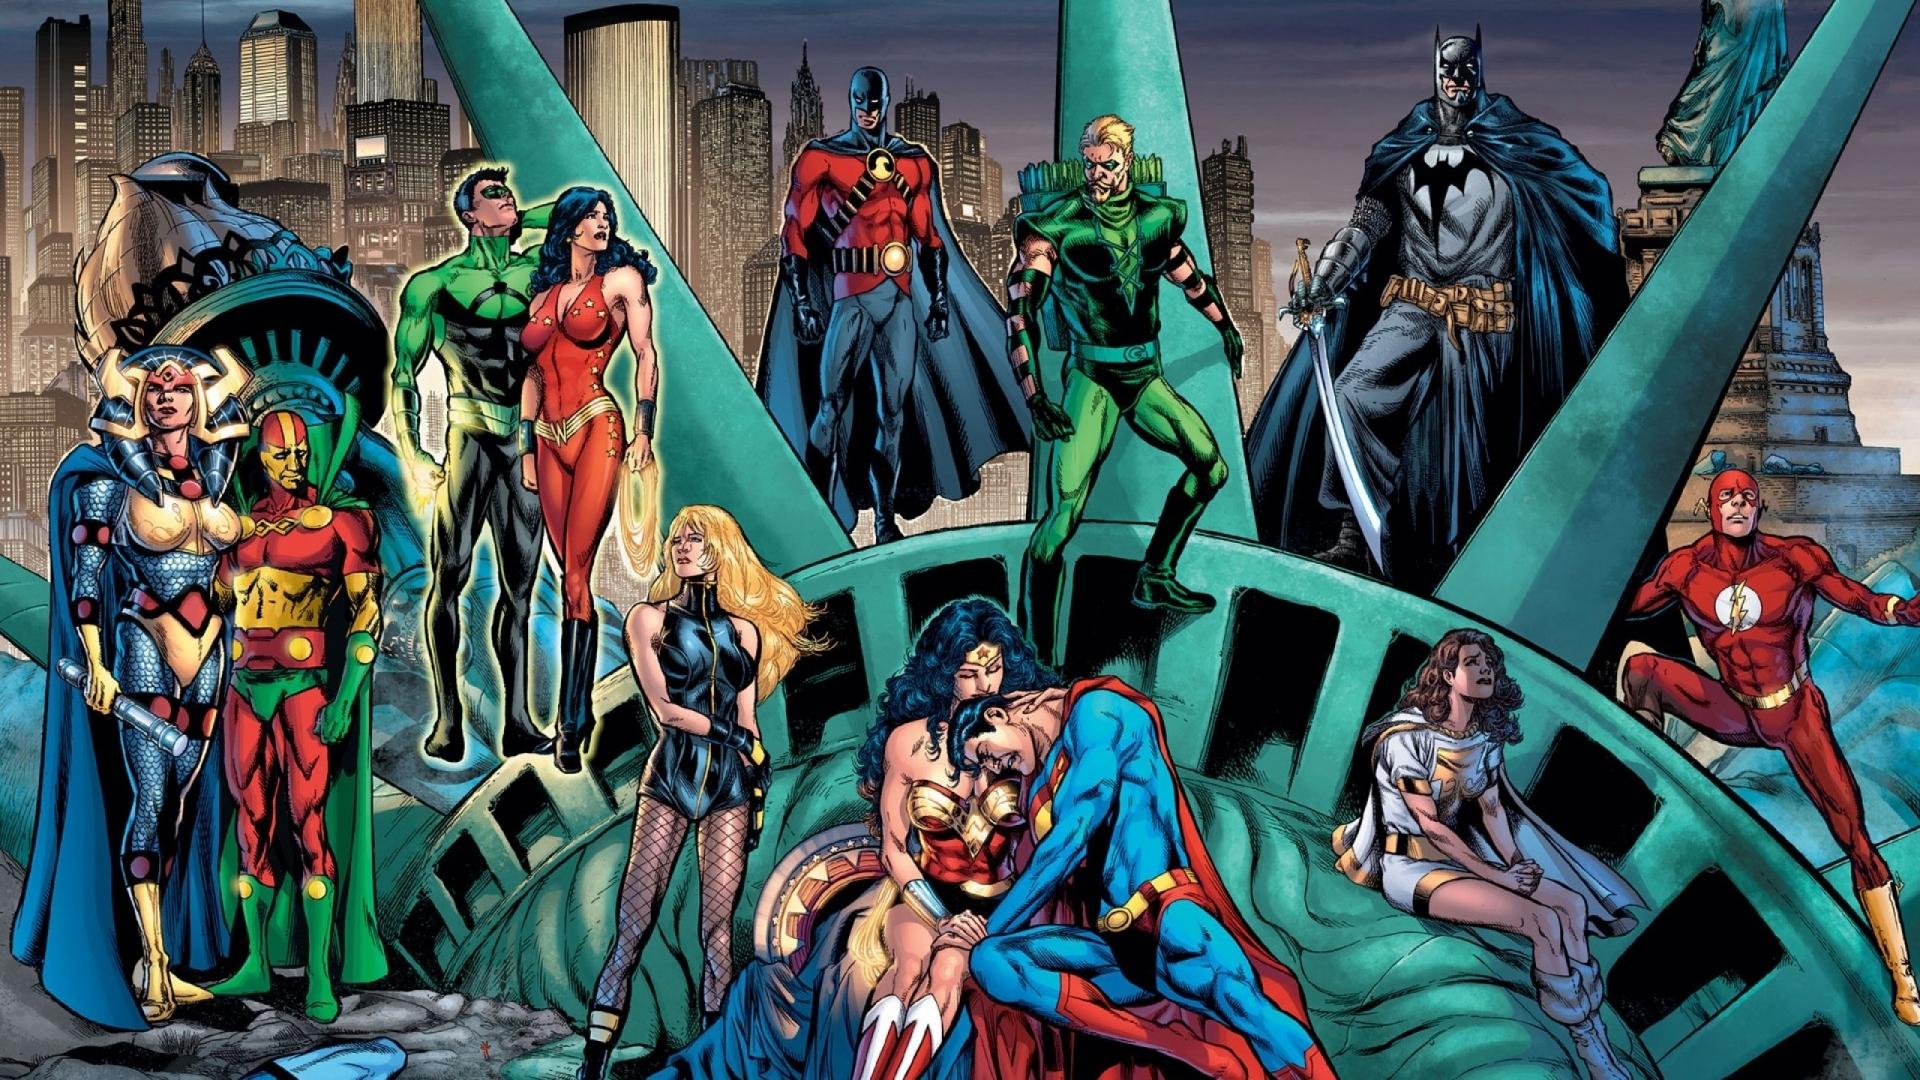 DC-Comics-Characters-Wallpaper-1920x1080.jpg